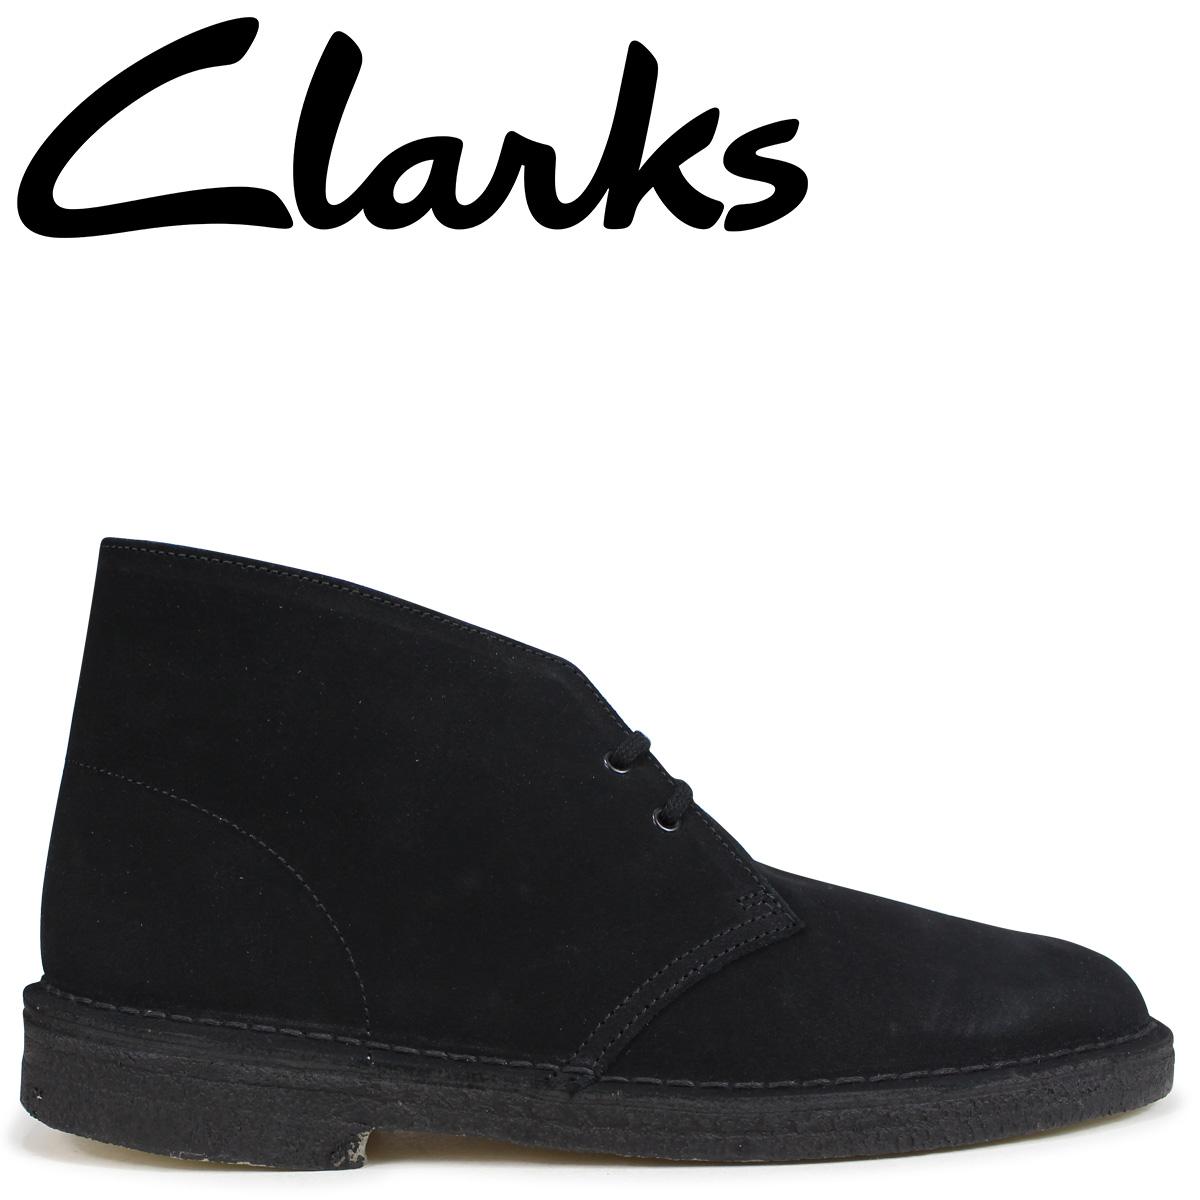 low priced fdd1b 91779 Point 2 x Clarks originals Clarks ORIGINALS desert boots DESERT BOOT G wise  suede mens 26107882 black  2 28 new in stock   regular